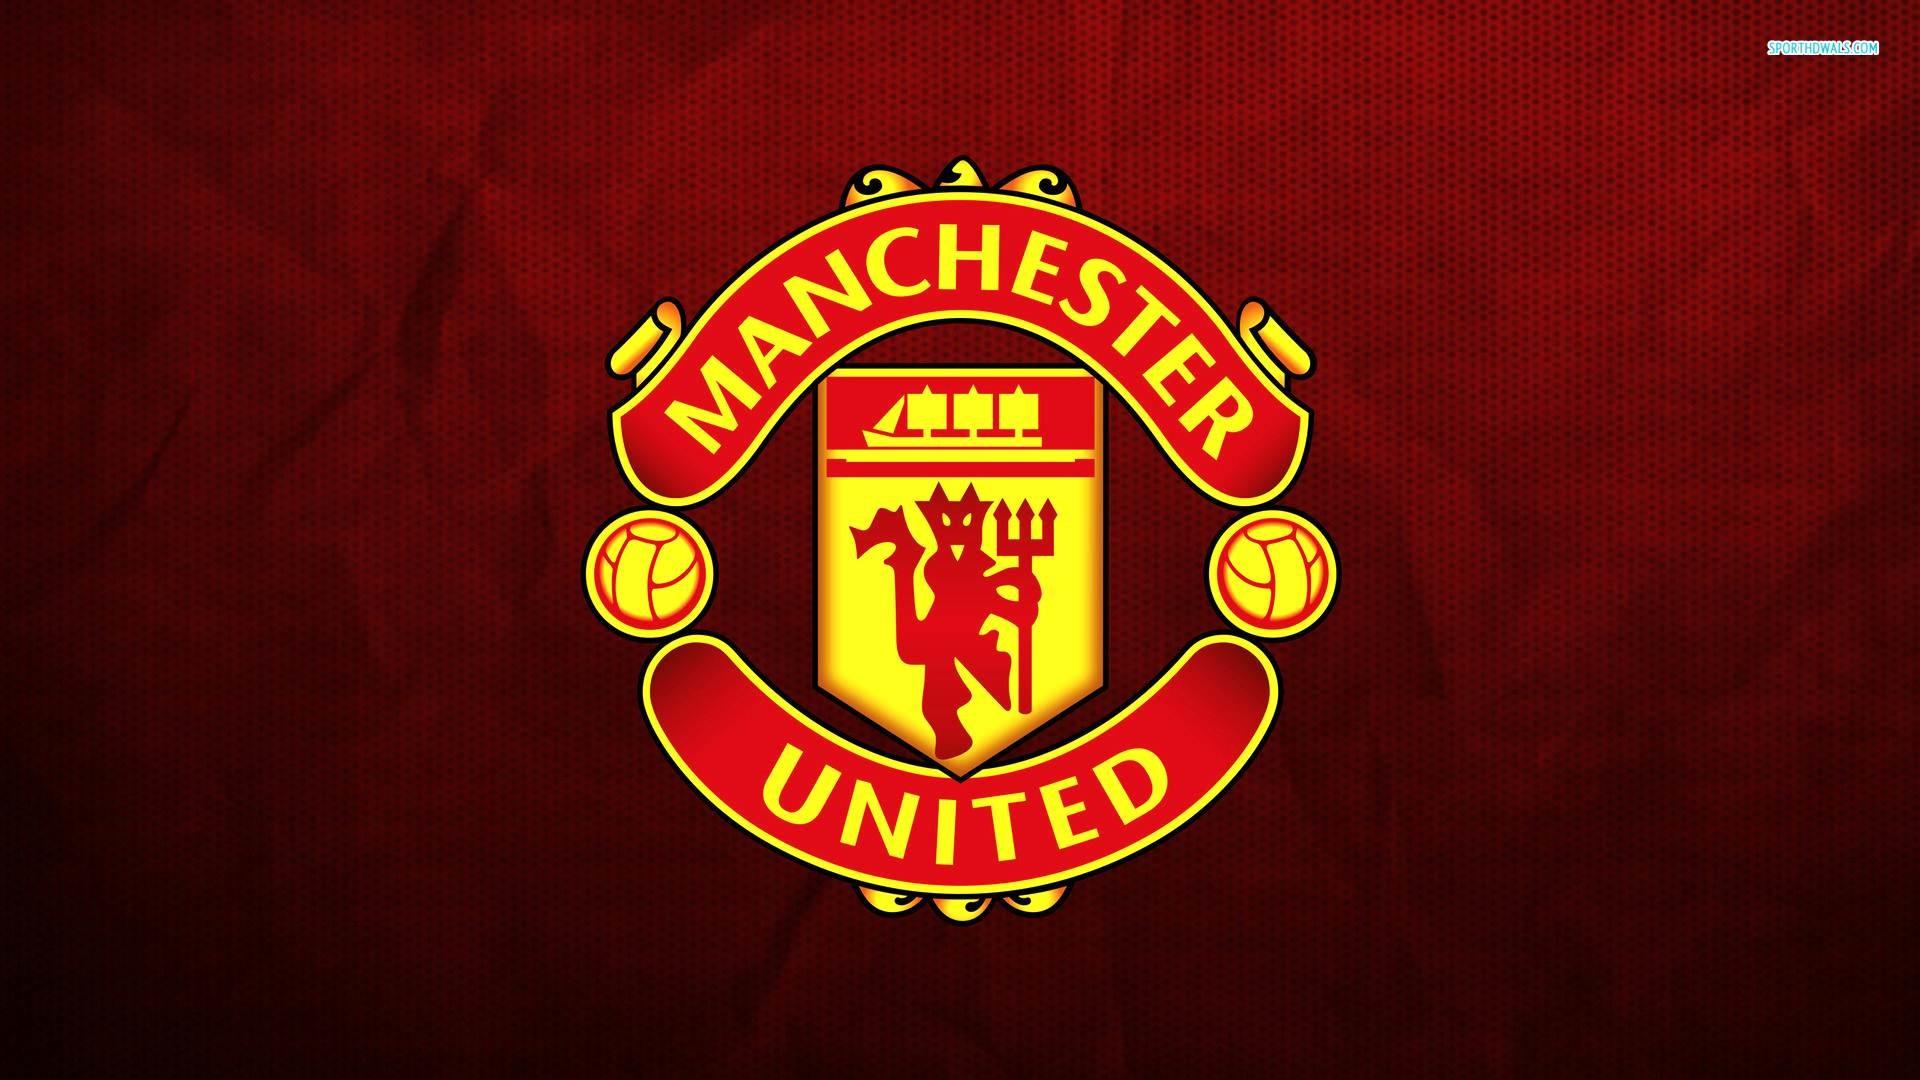 Manchester United HD Wallpaper